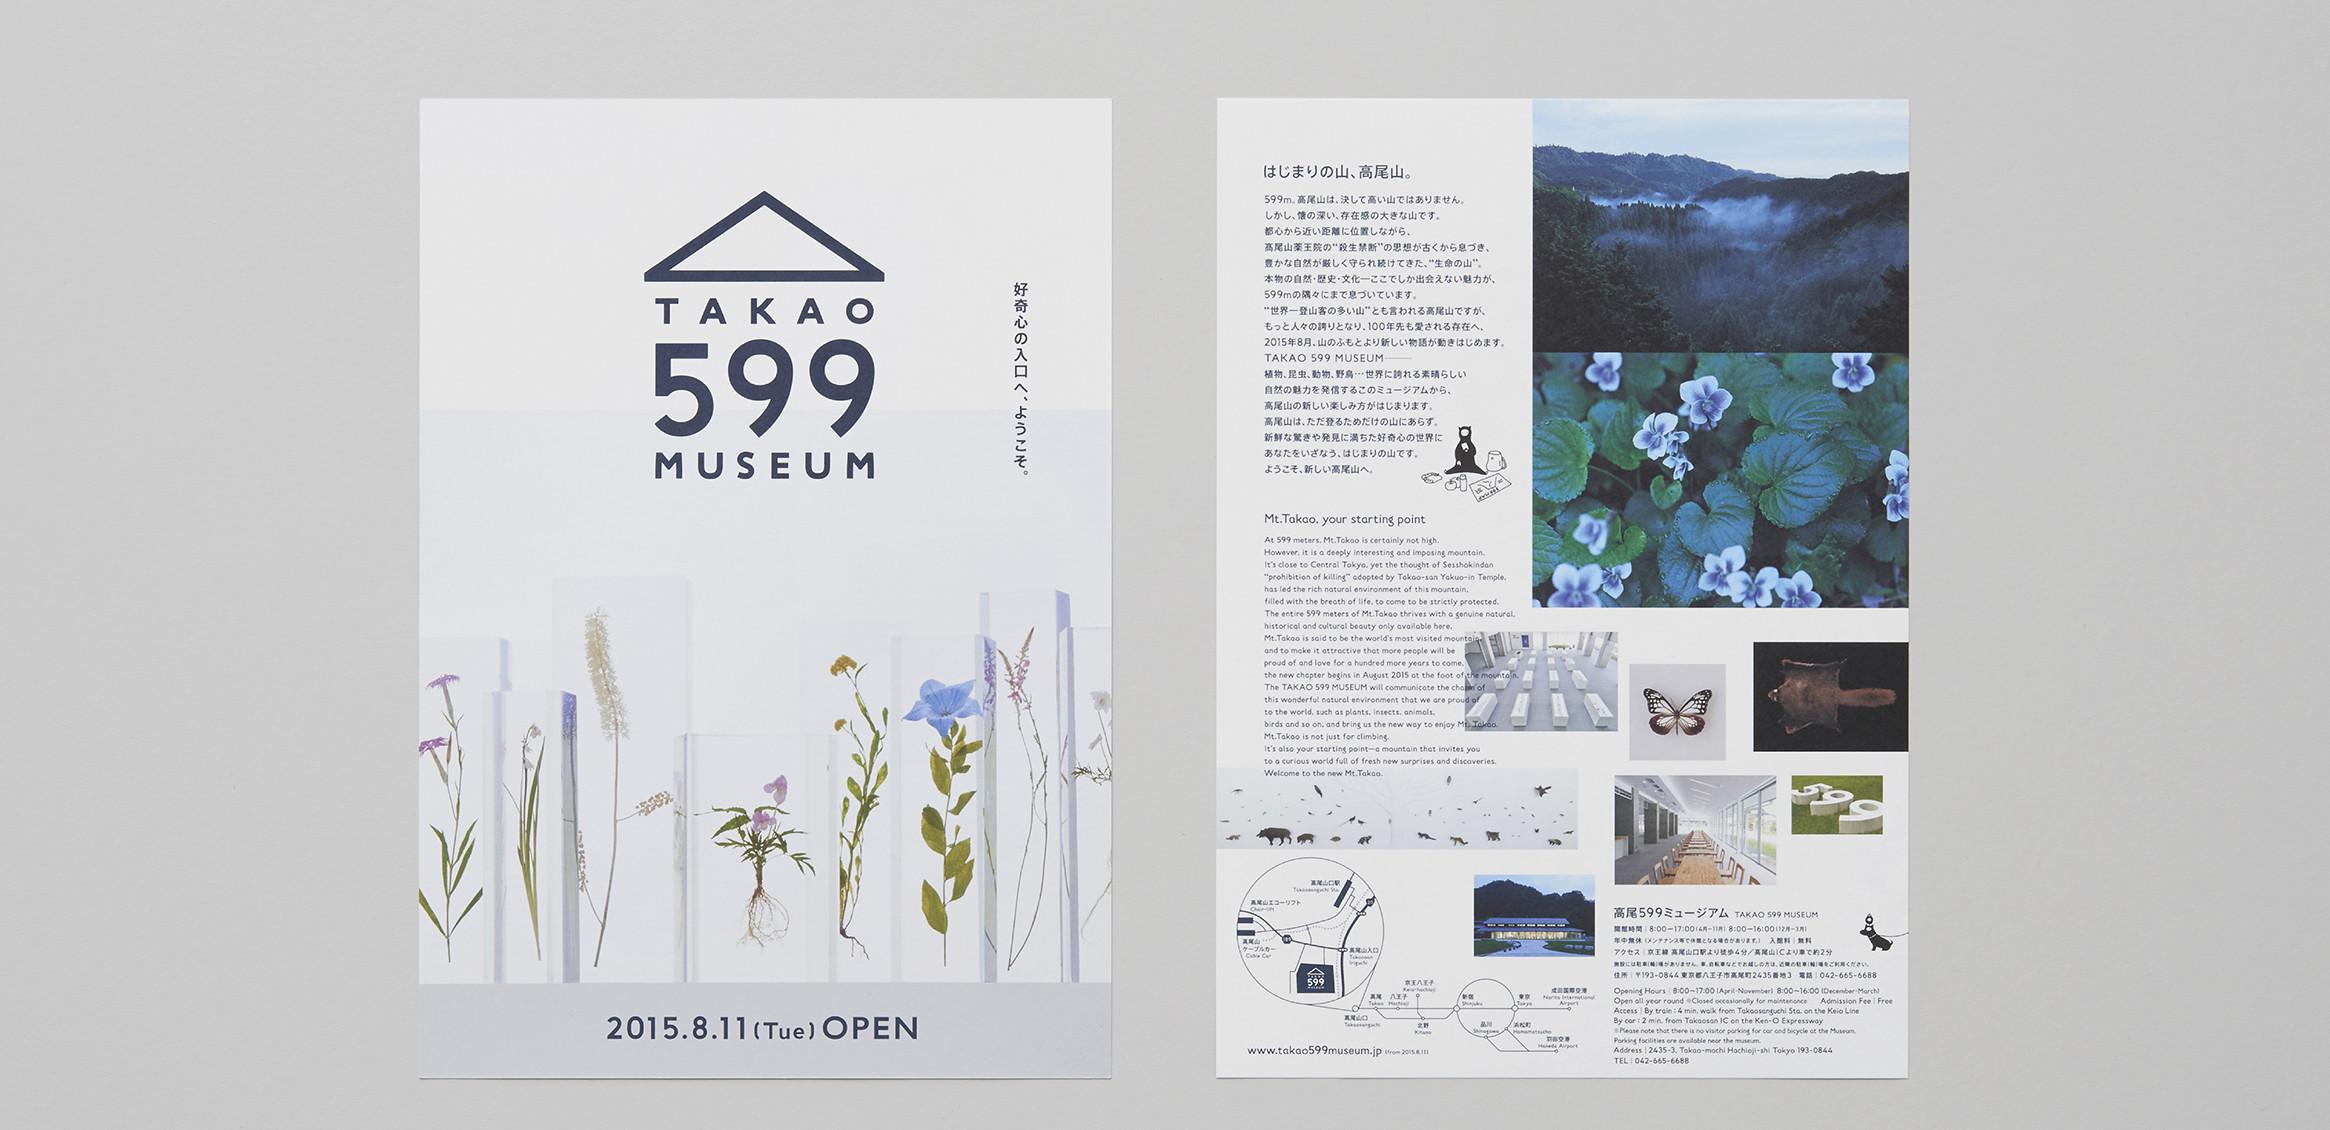 TAKAO 599 MUSEUM3枚目